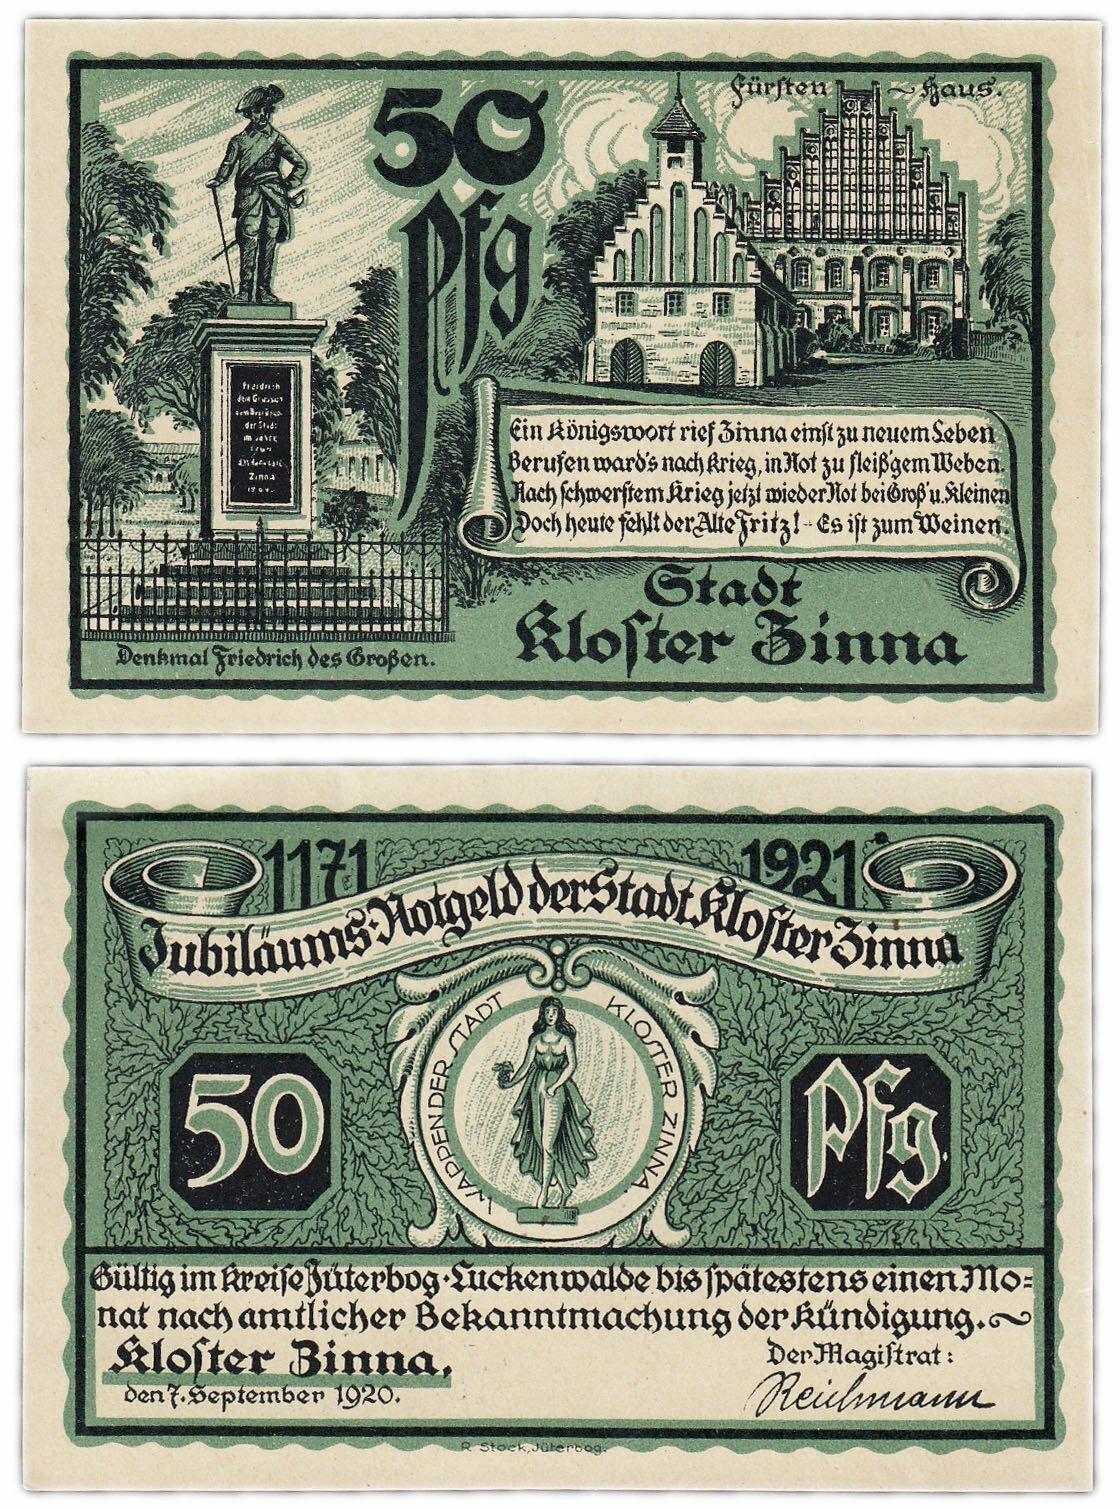 Банкнота Германия (Бранденбург: Клостер-Цинна) 50 пфеннигов 1921